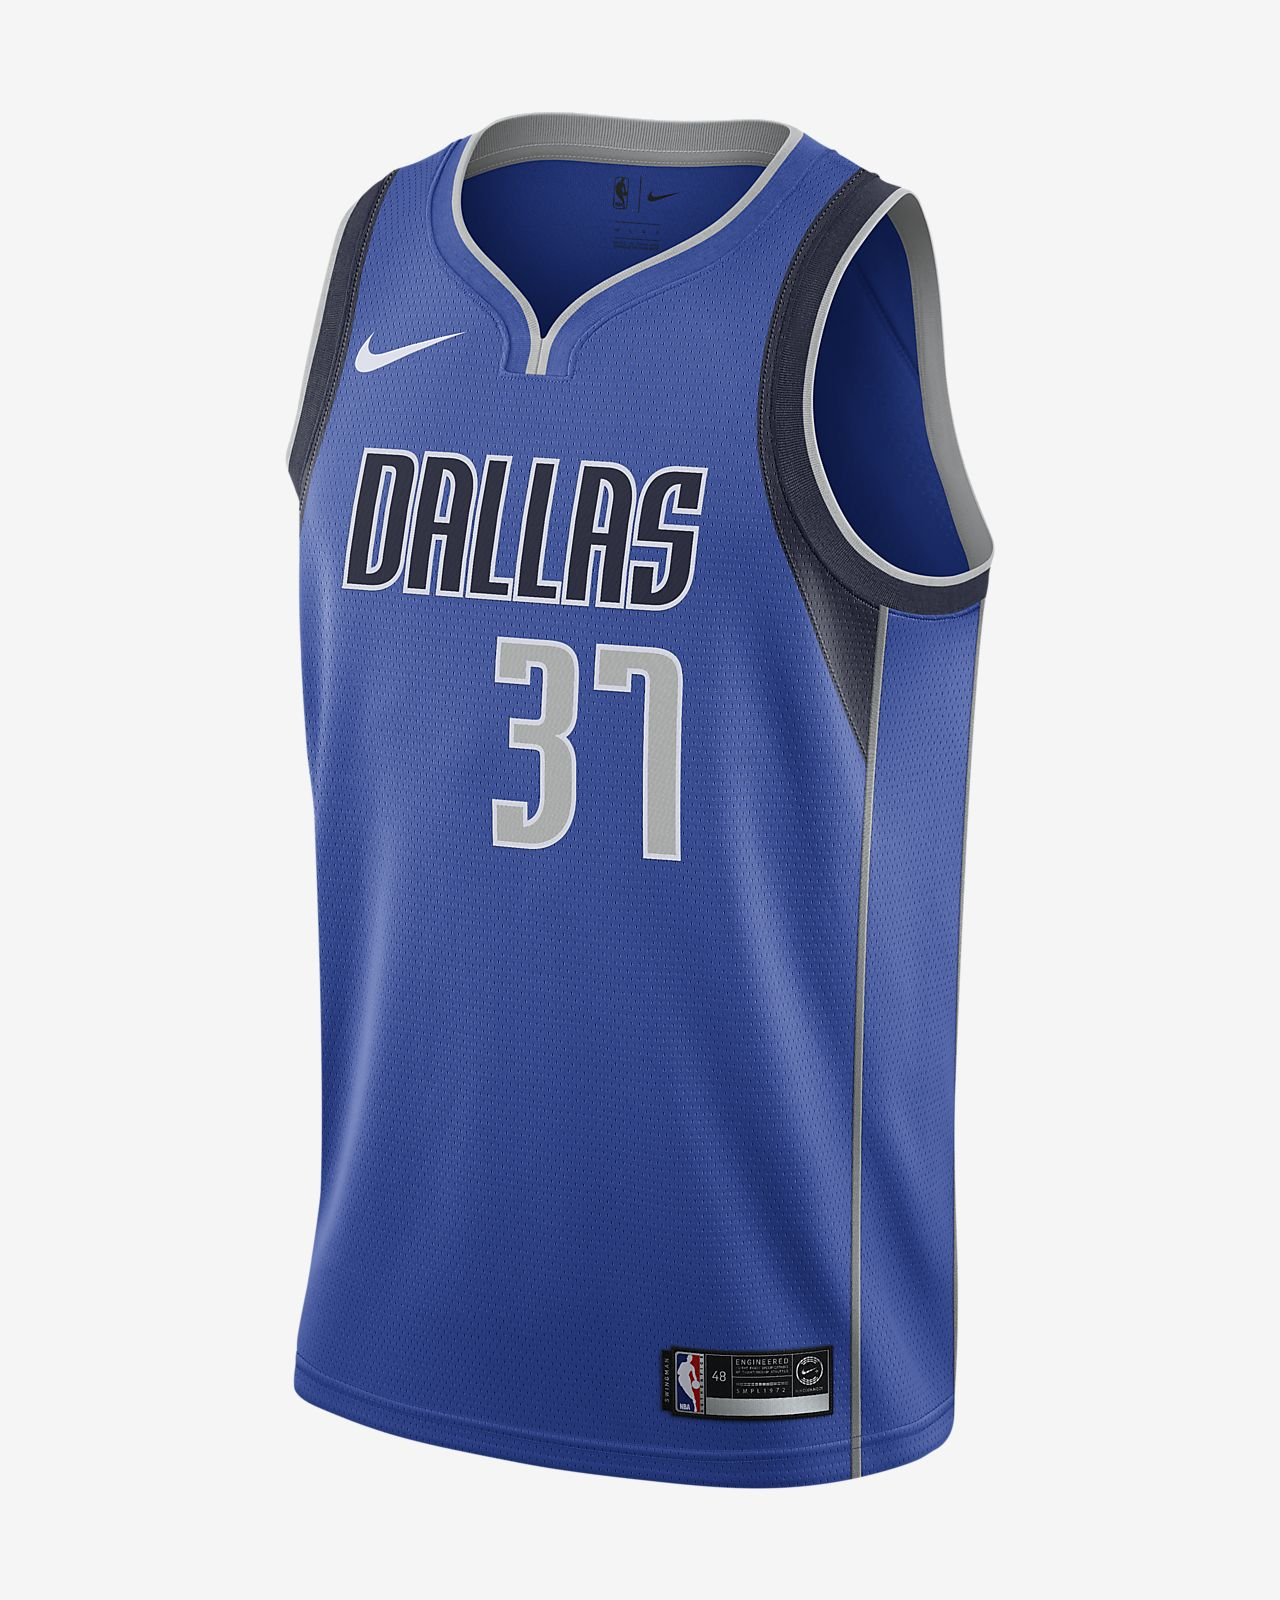 Maglia Nike NBA Connected Kostas Antetokounmpo Icon Edition Swingman (Dallas Mavericks) - Uomo